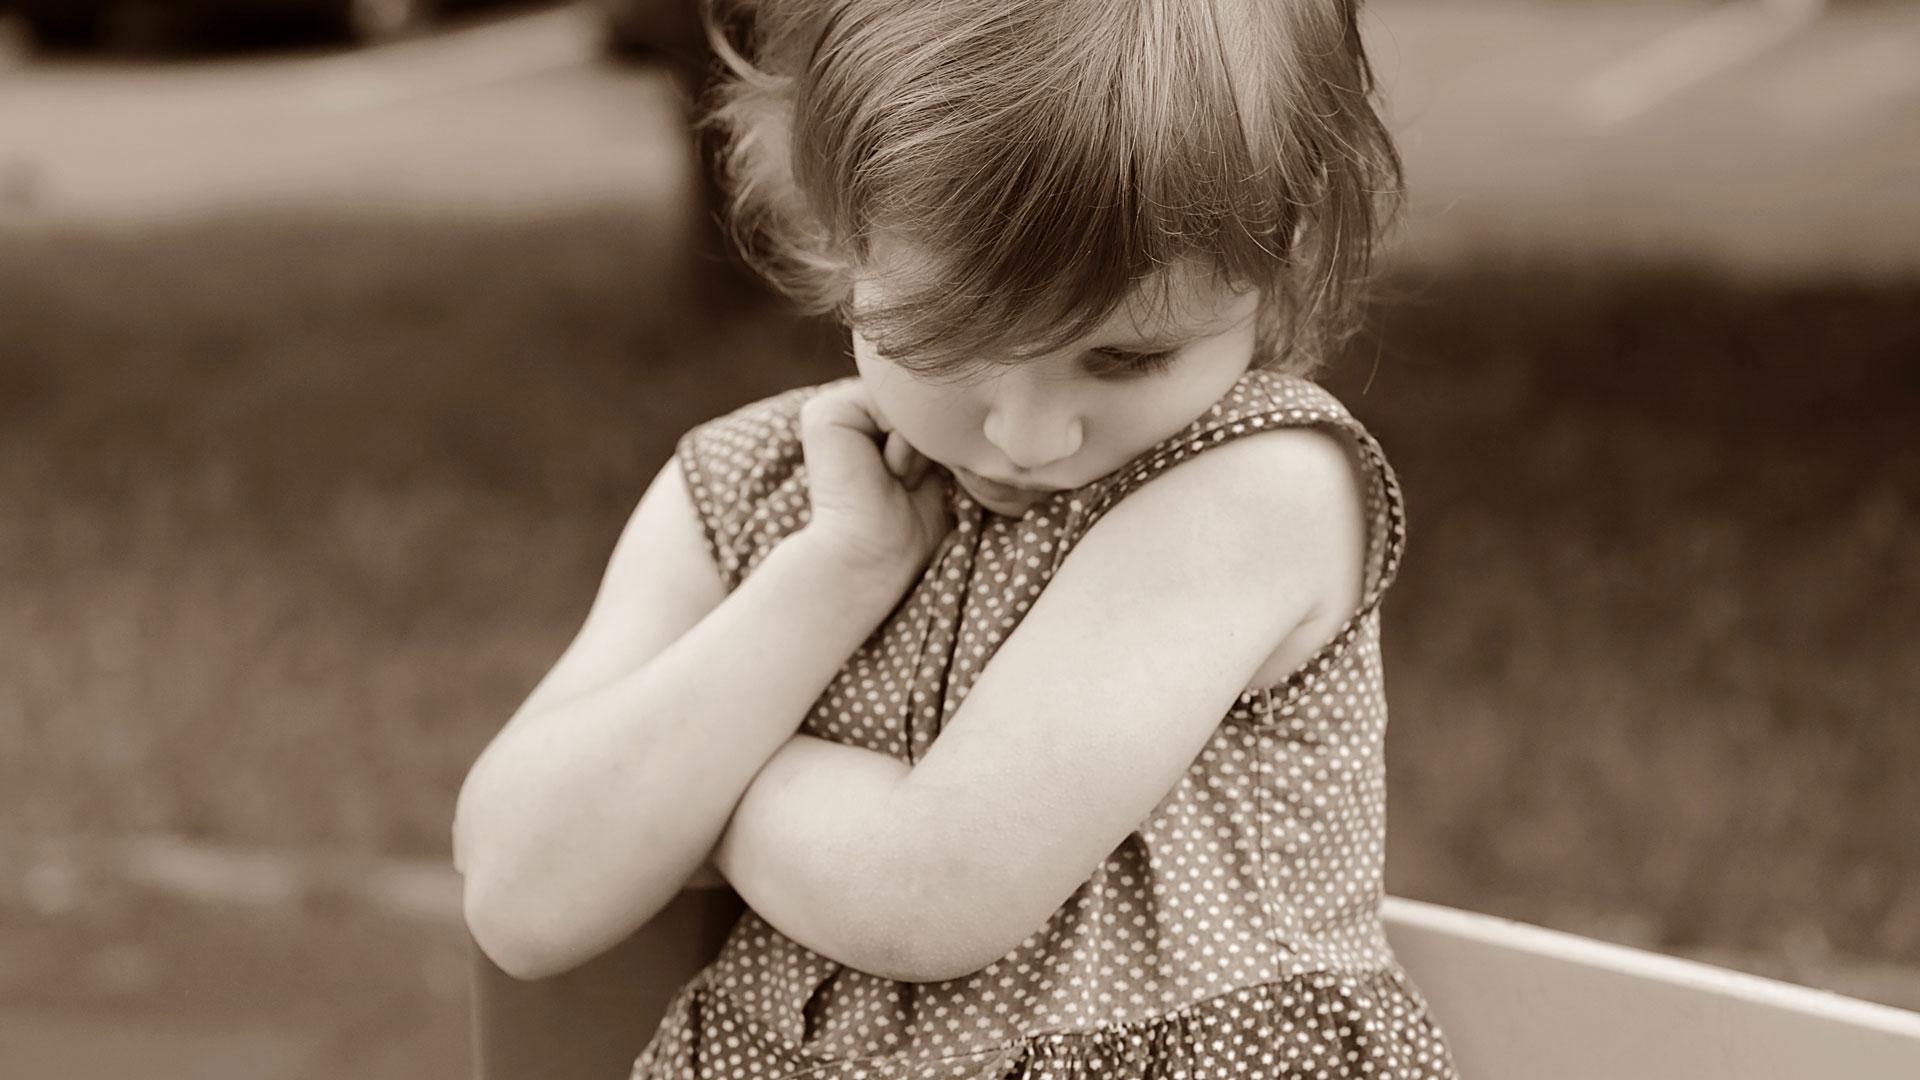 Little girl looking worried